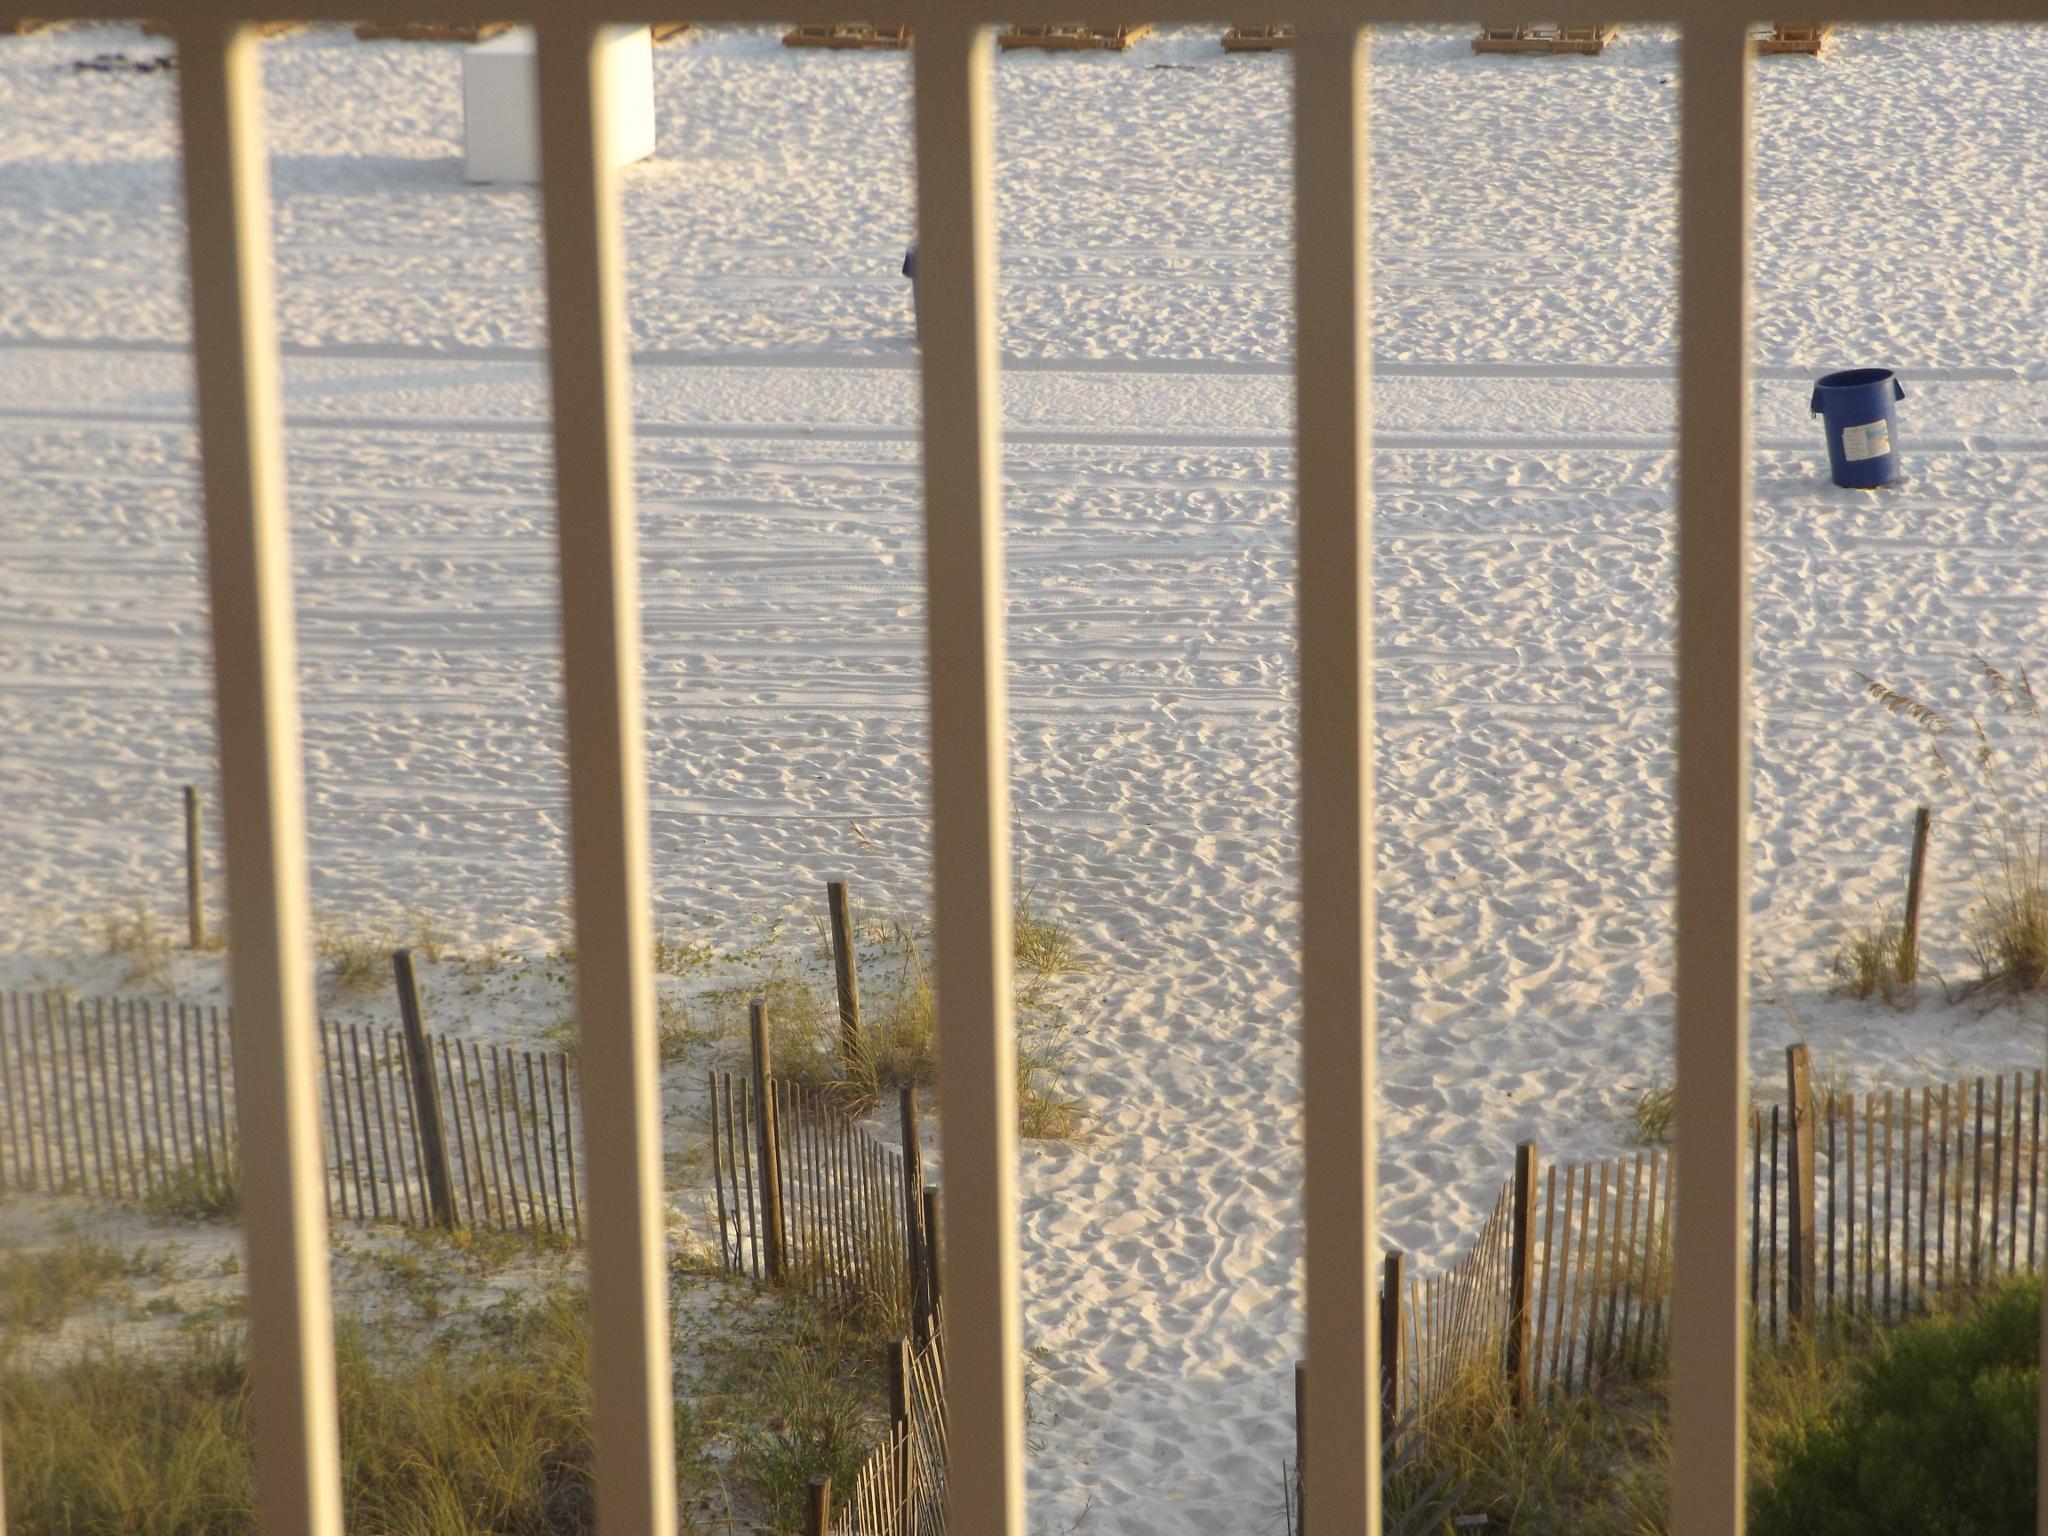 Balcony at the beach by lisarobertsbell